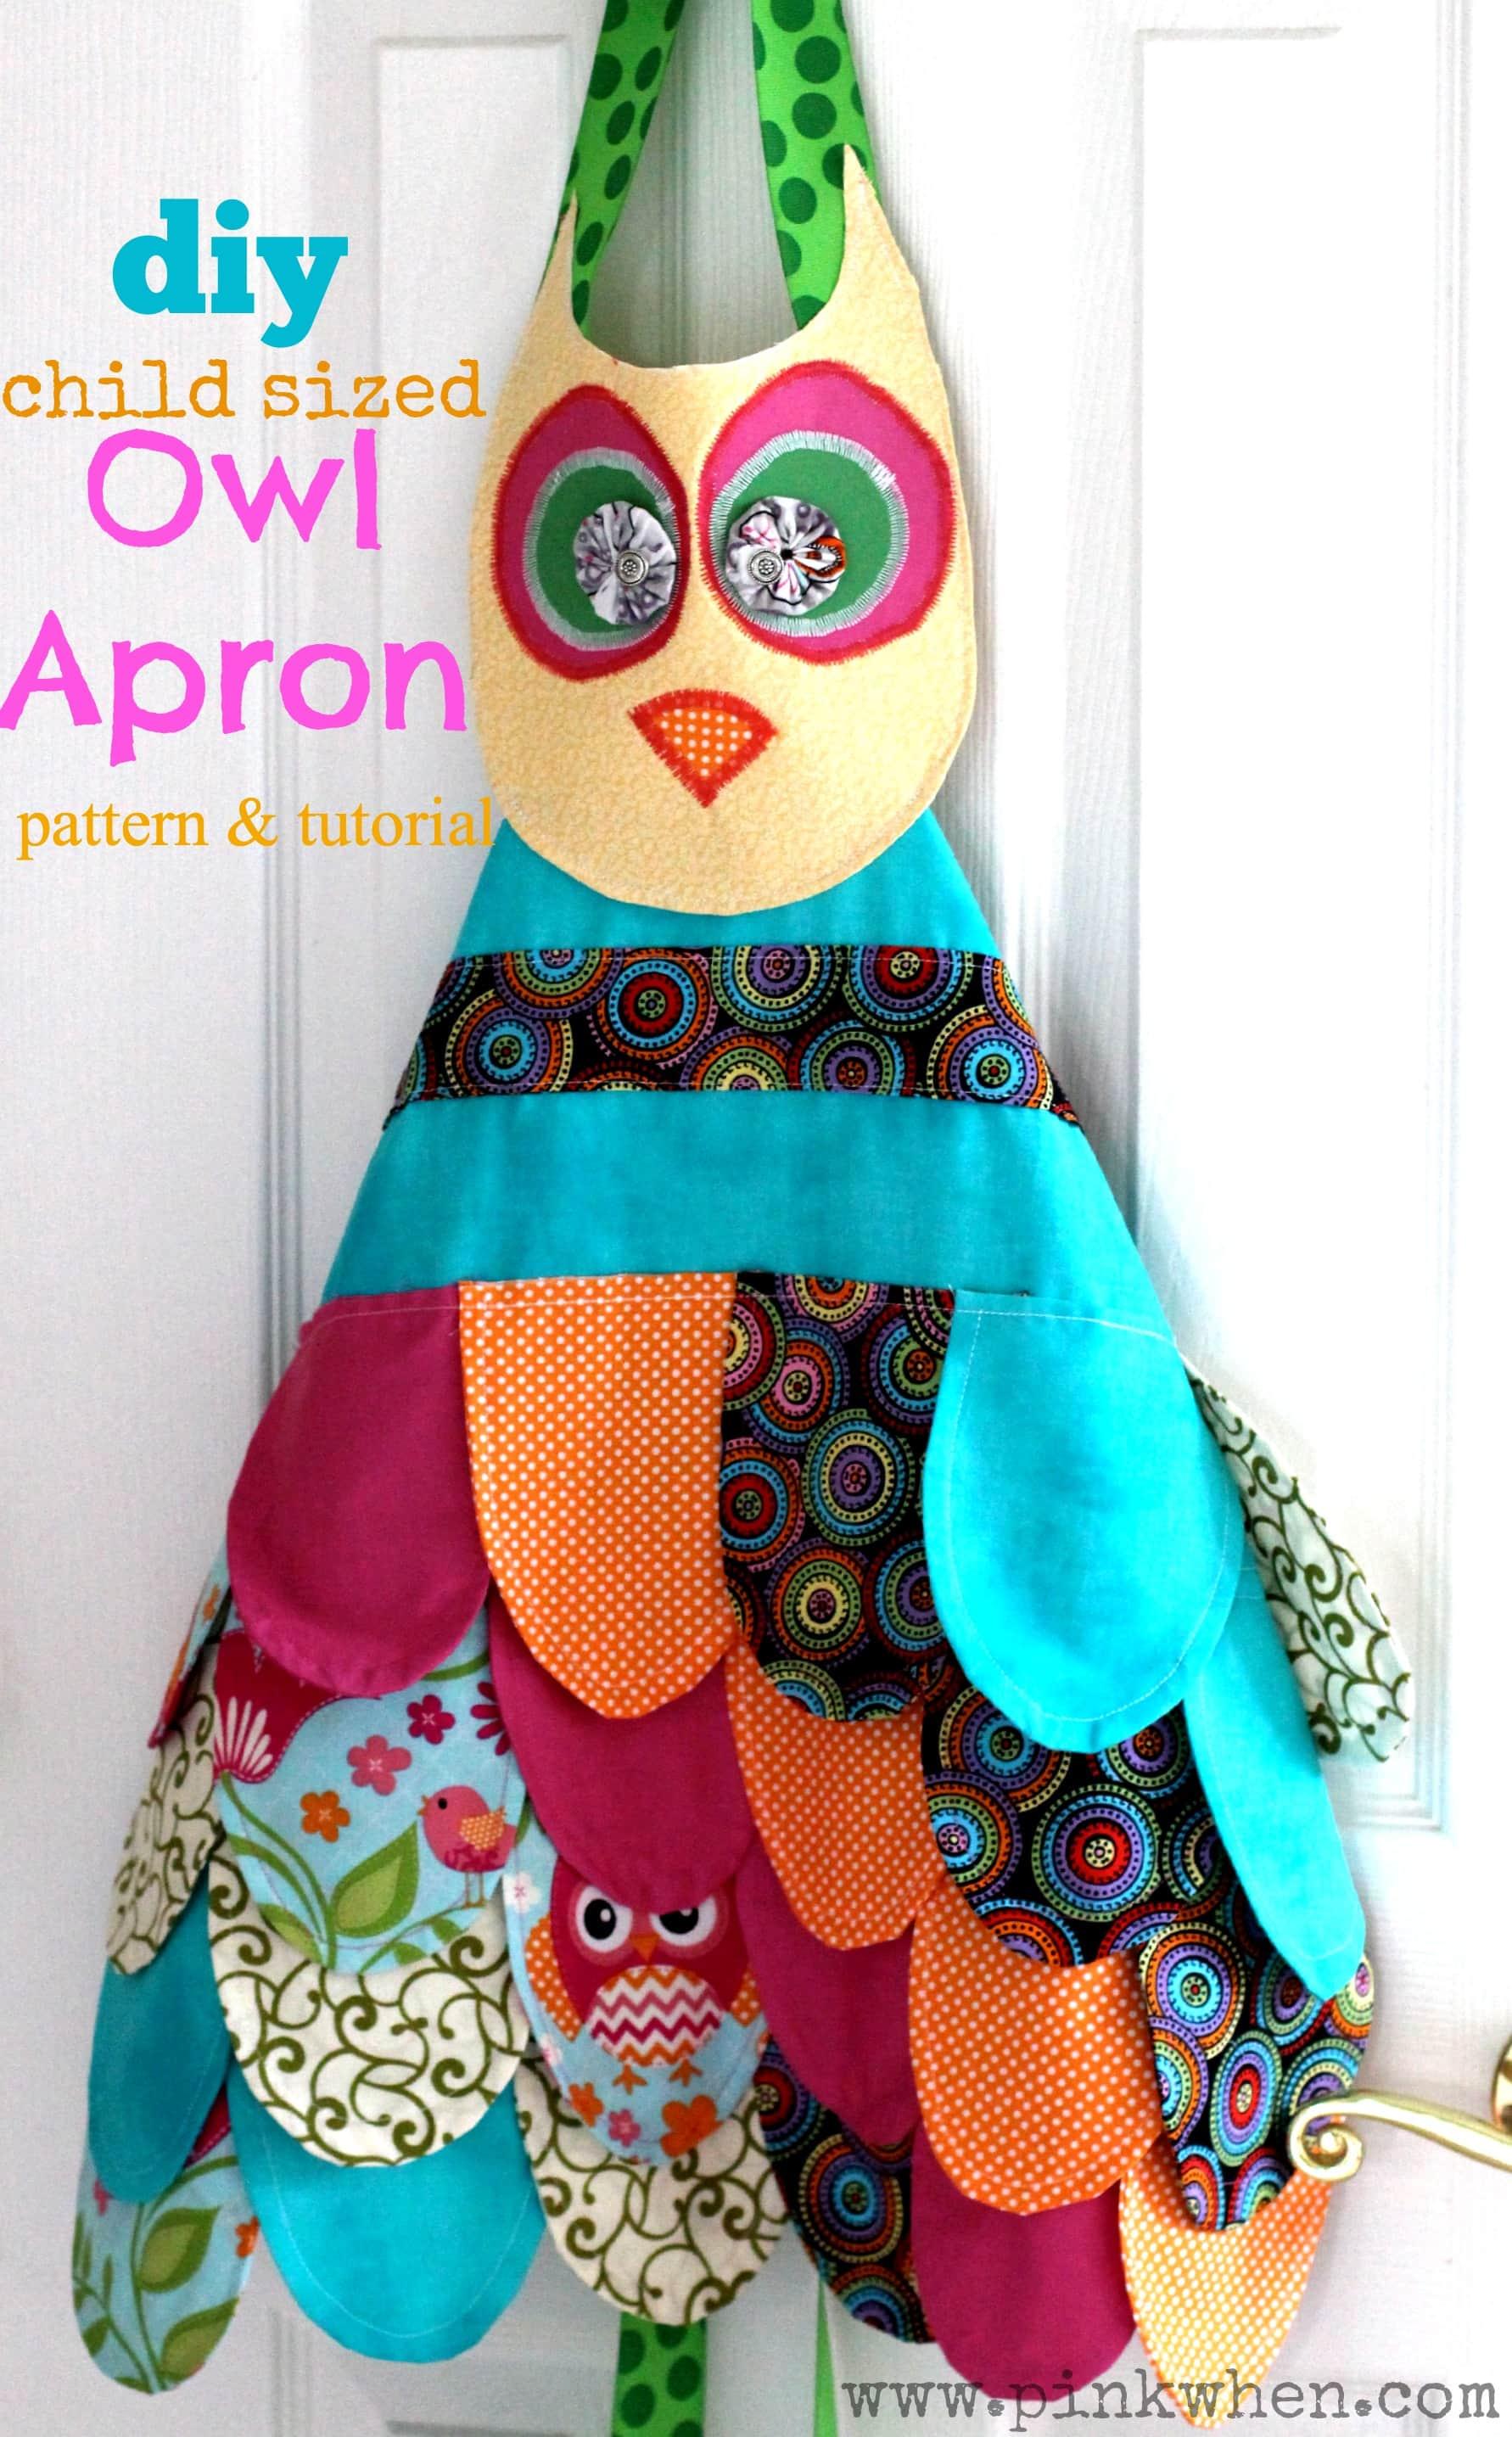 My Little Owl Apron - Toddler & Child Owl Apron Tutorial - PinkWhen.com